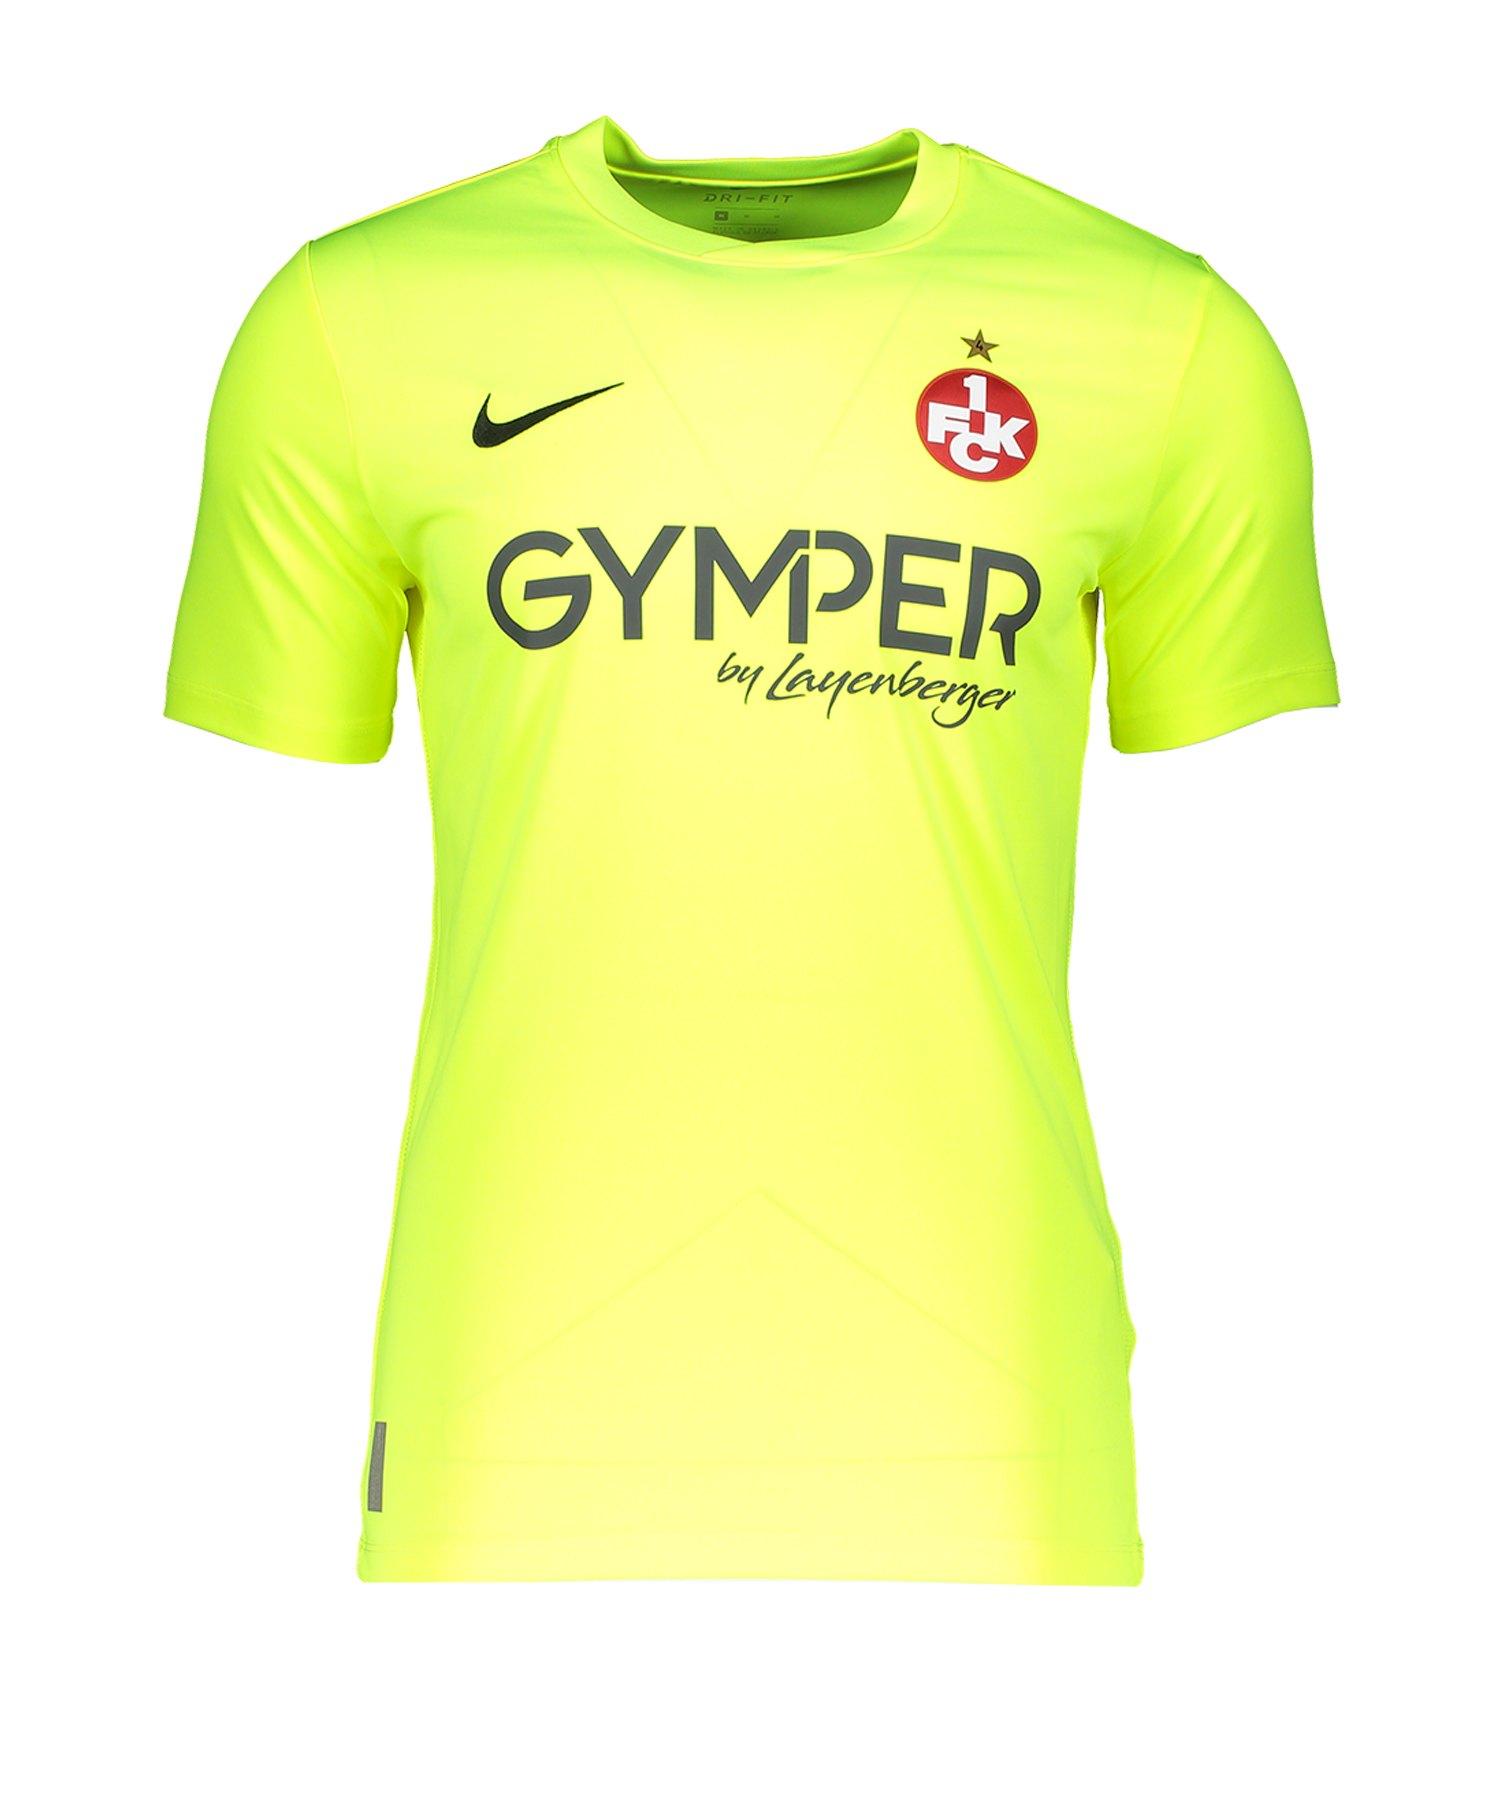 Nike 1. FC Kaiserslautern TW-Trikot 19/20 F702 - gelb